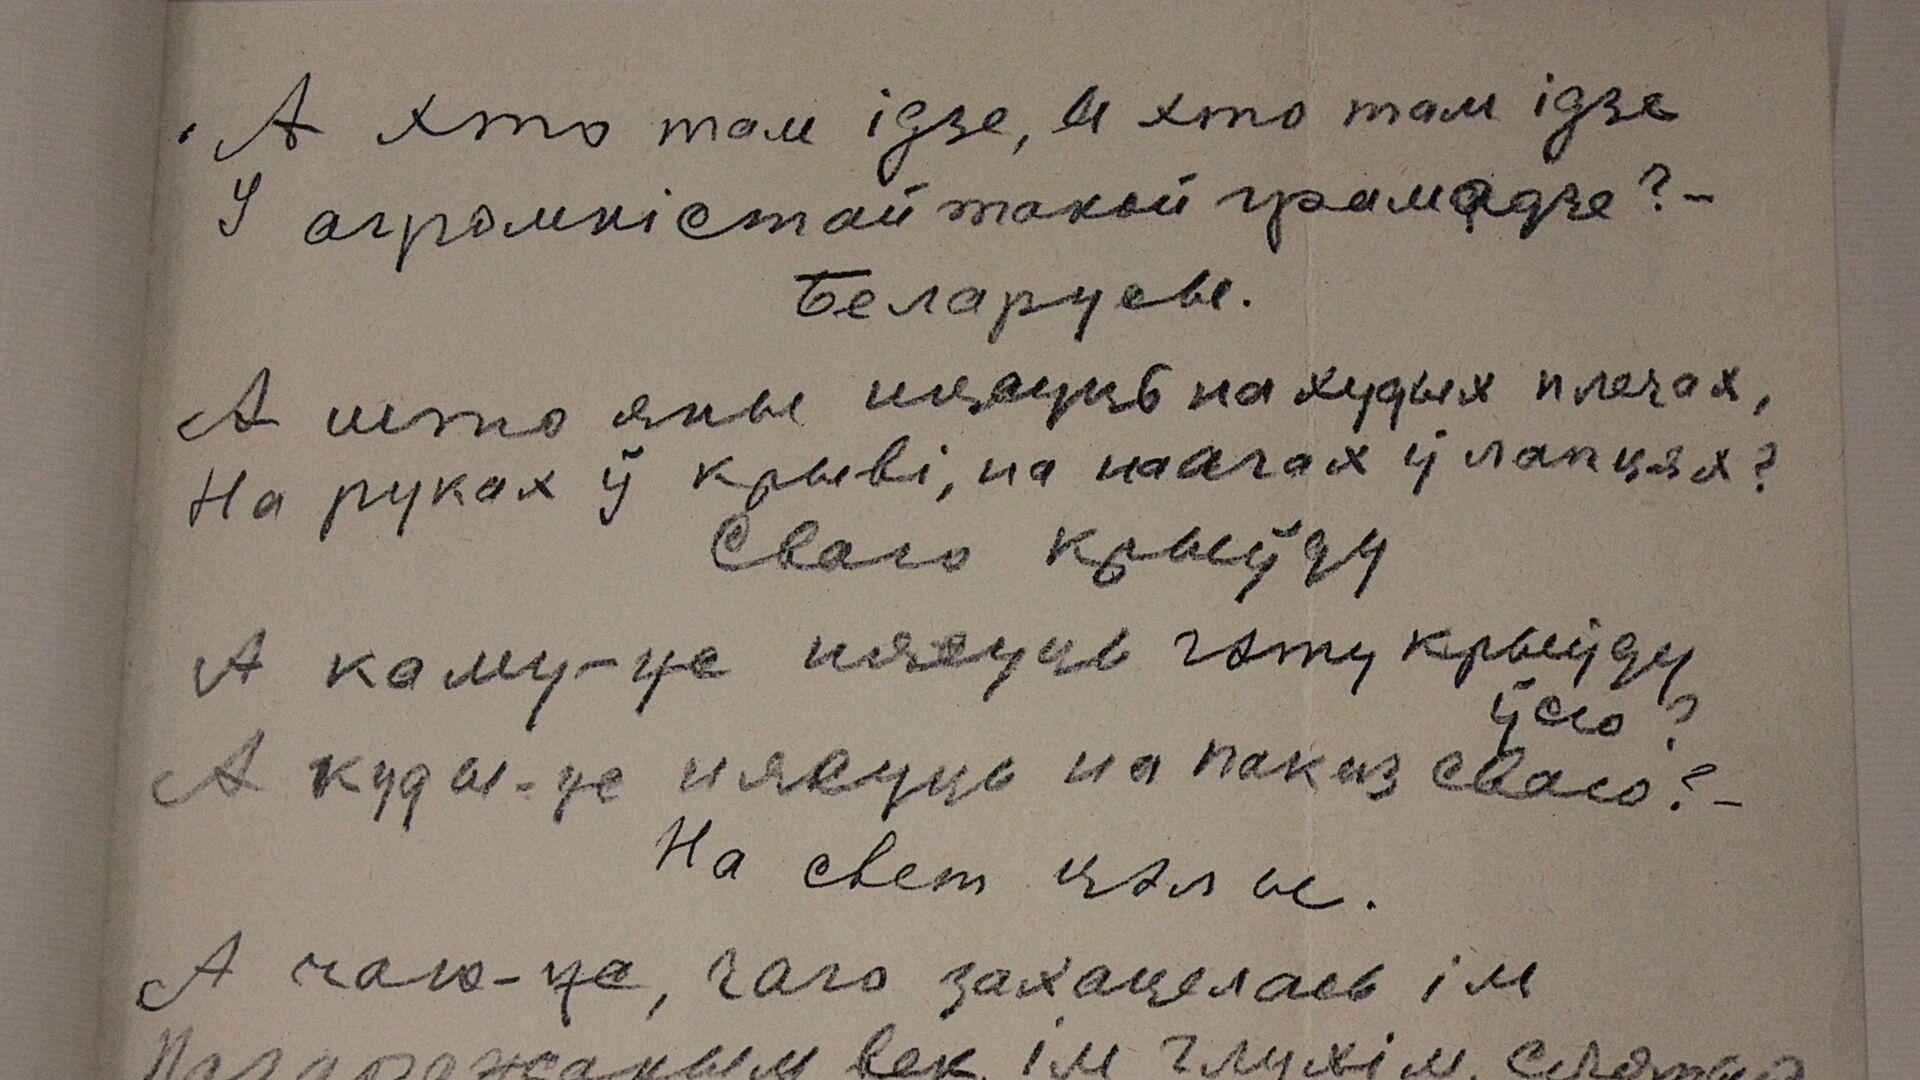 Факсіміле верша А хто там ідзе - Sputnik Беларусь, 1920, 07.07.2021